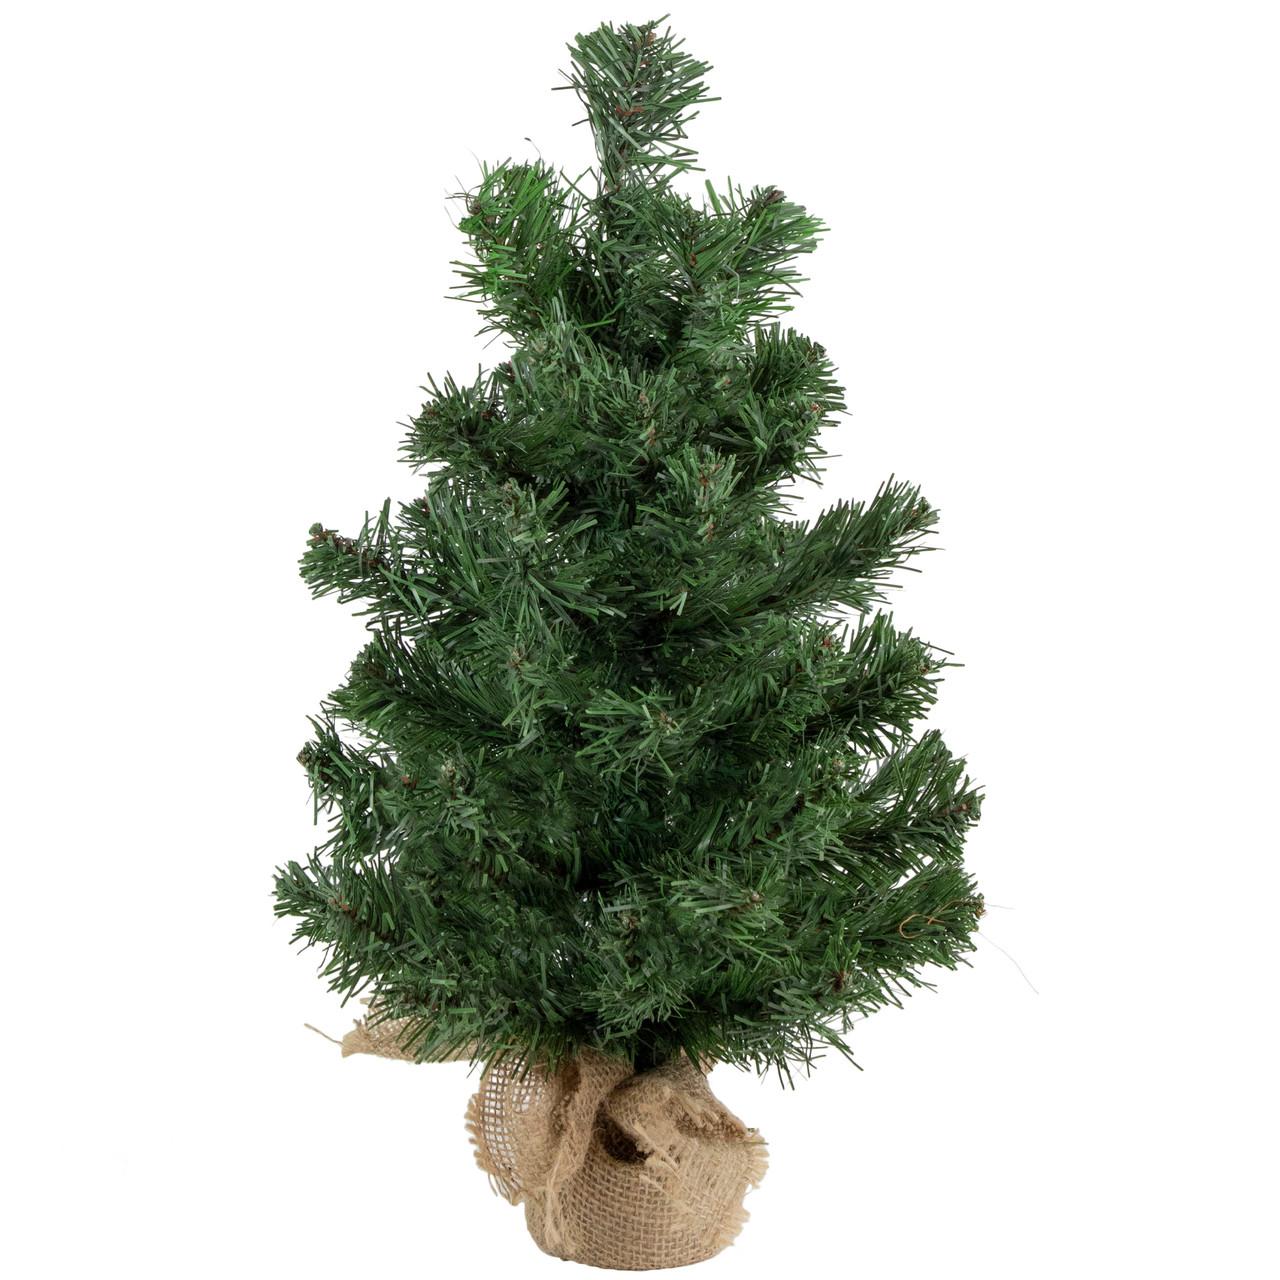 Miniature Artificial Christmas Trees: 18 Mini Pine Artificial Christmas Tree In Burlap Base